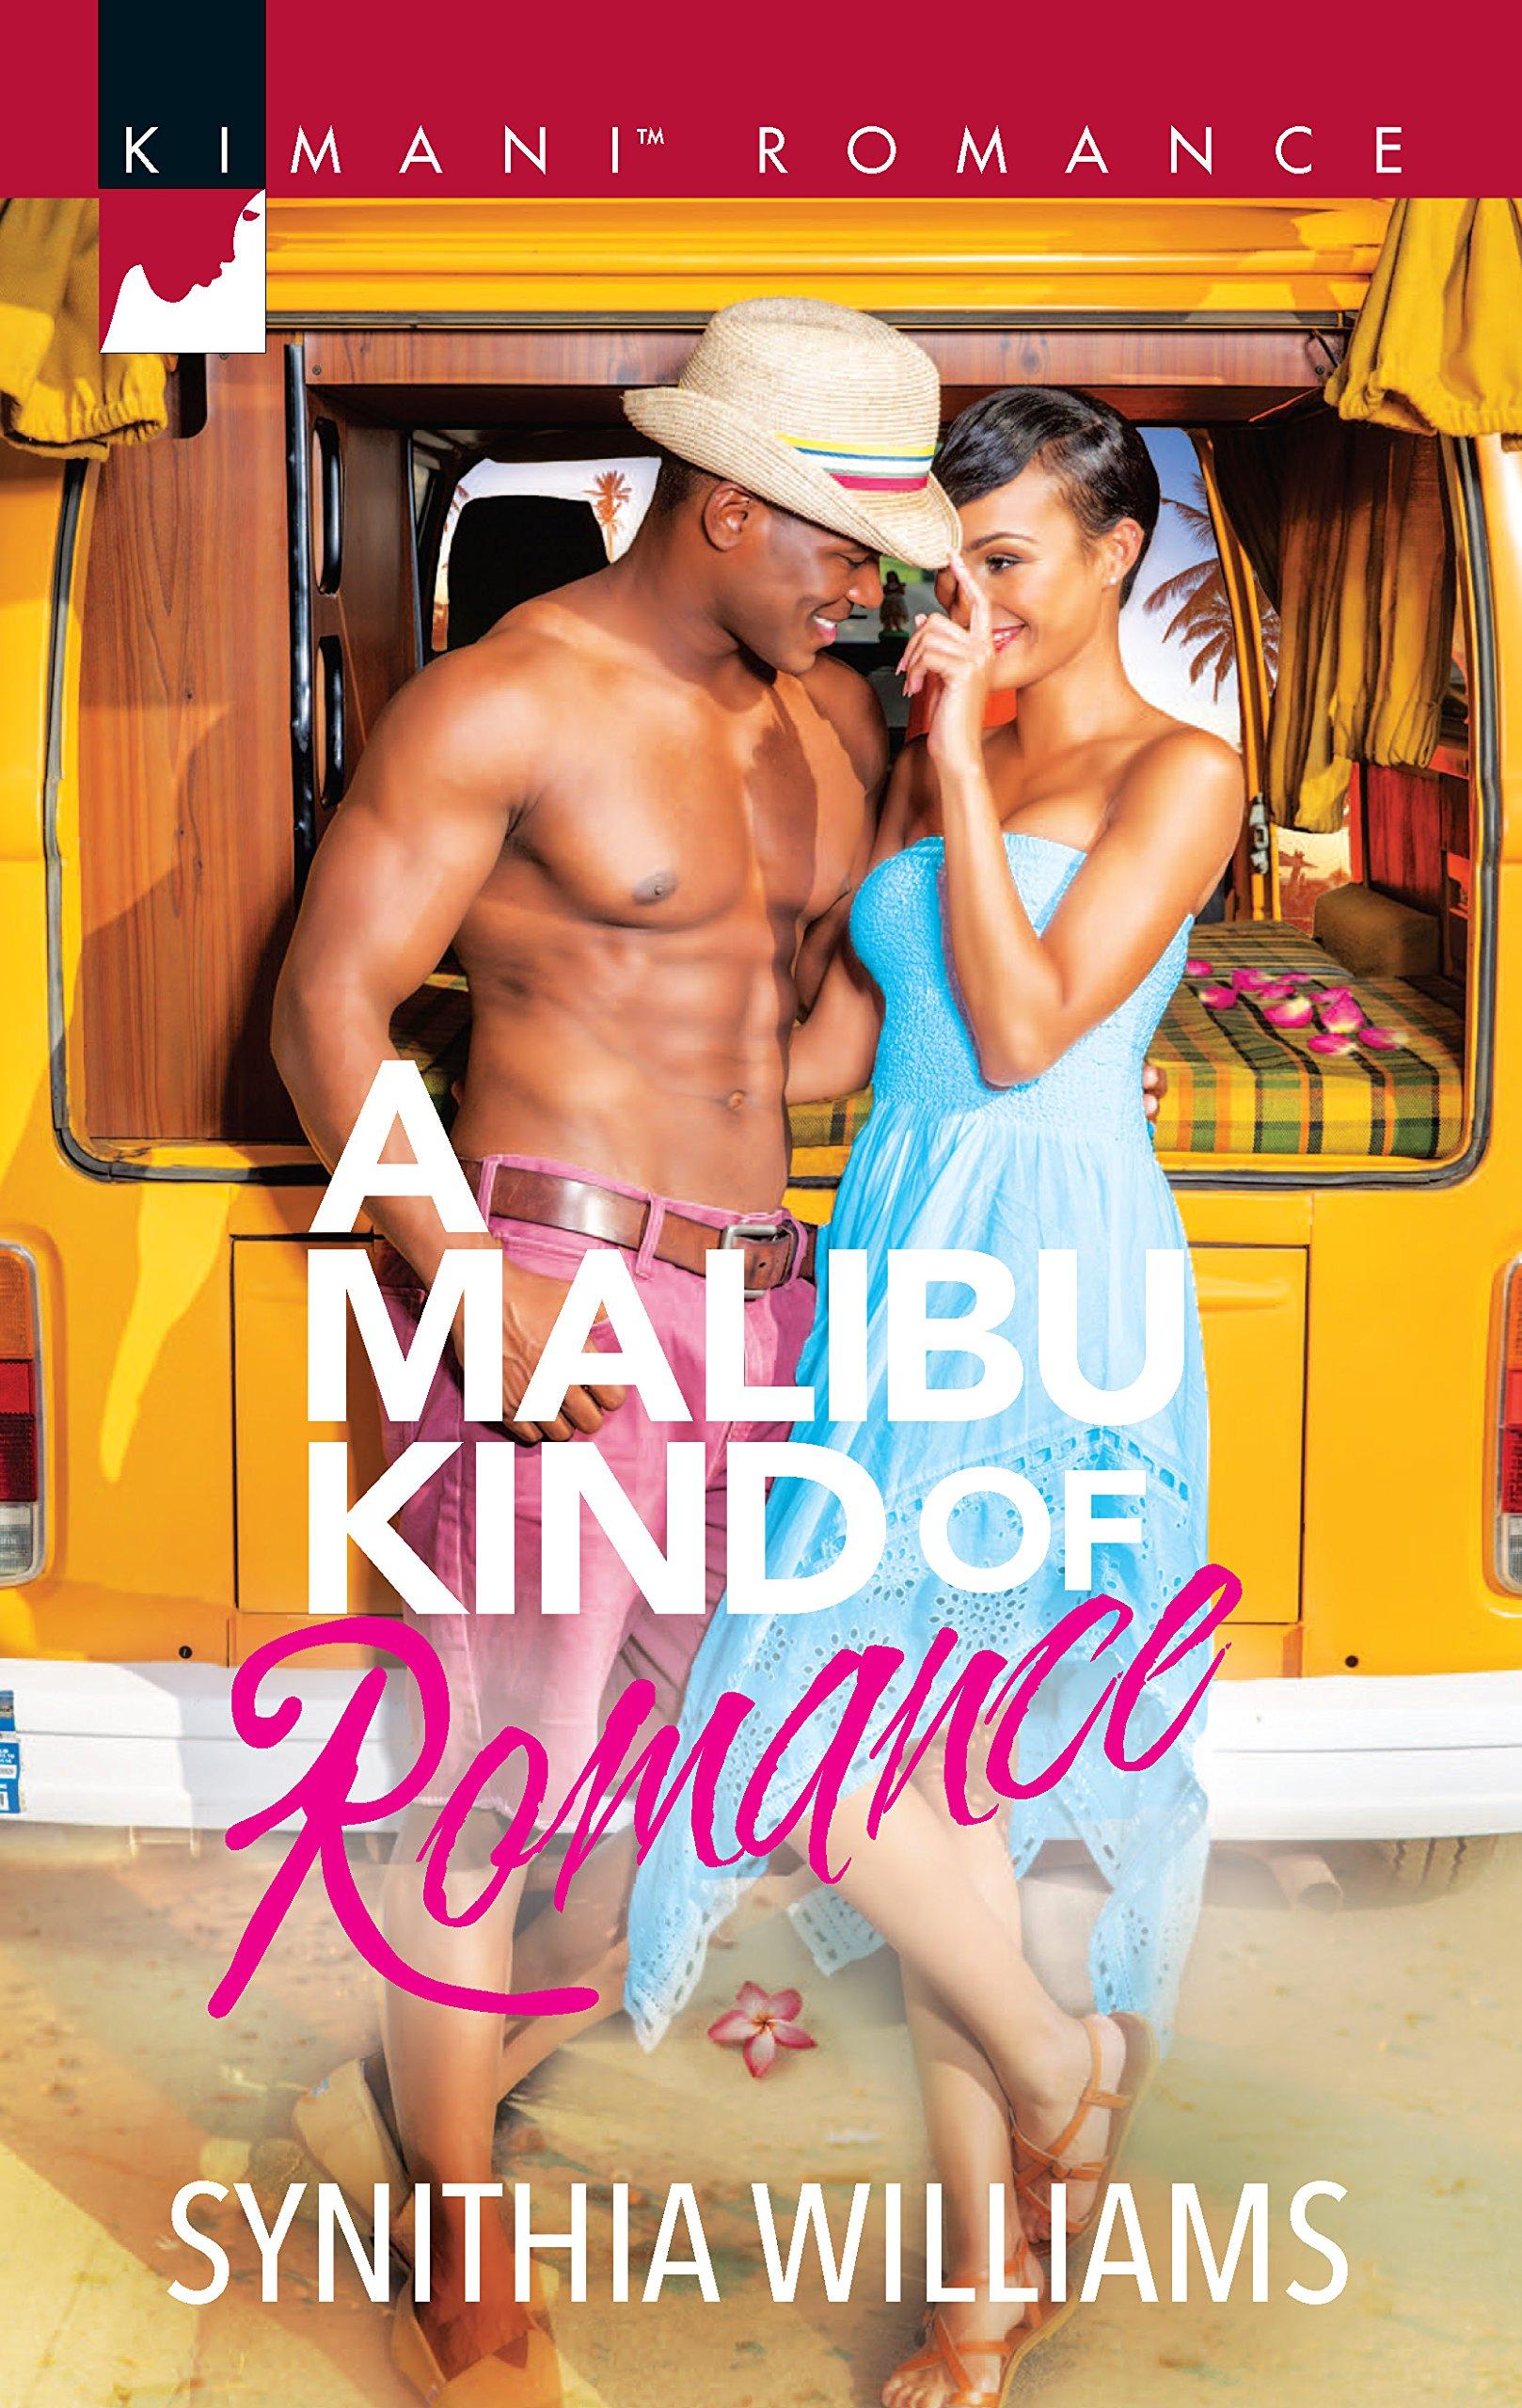 A Malibu Kind of Romance (Kimani Romance) ebook